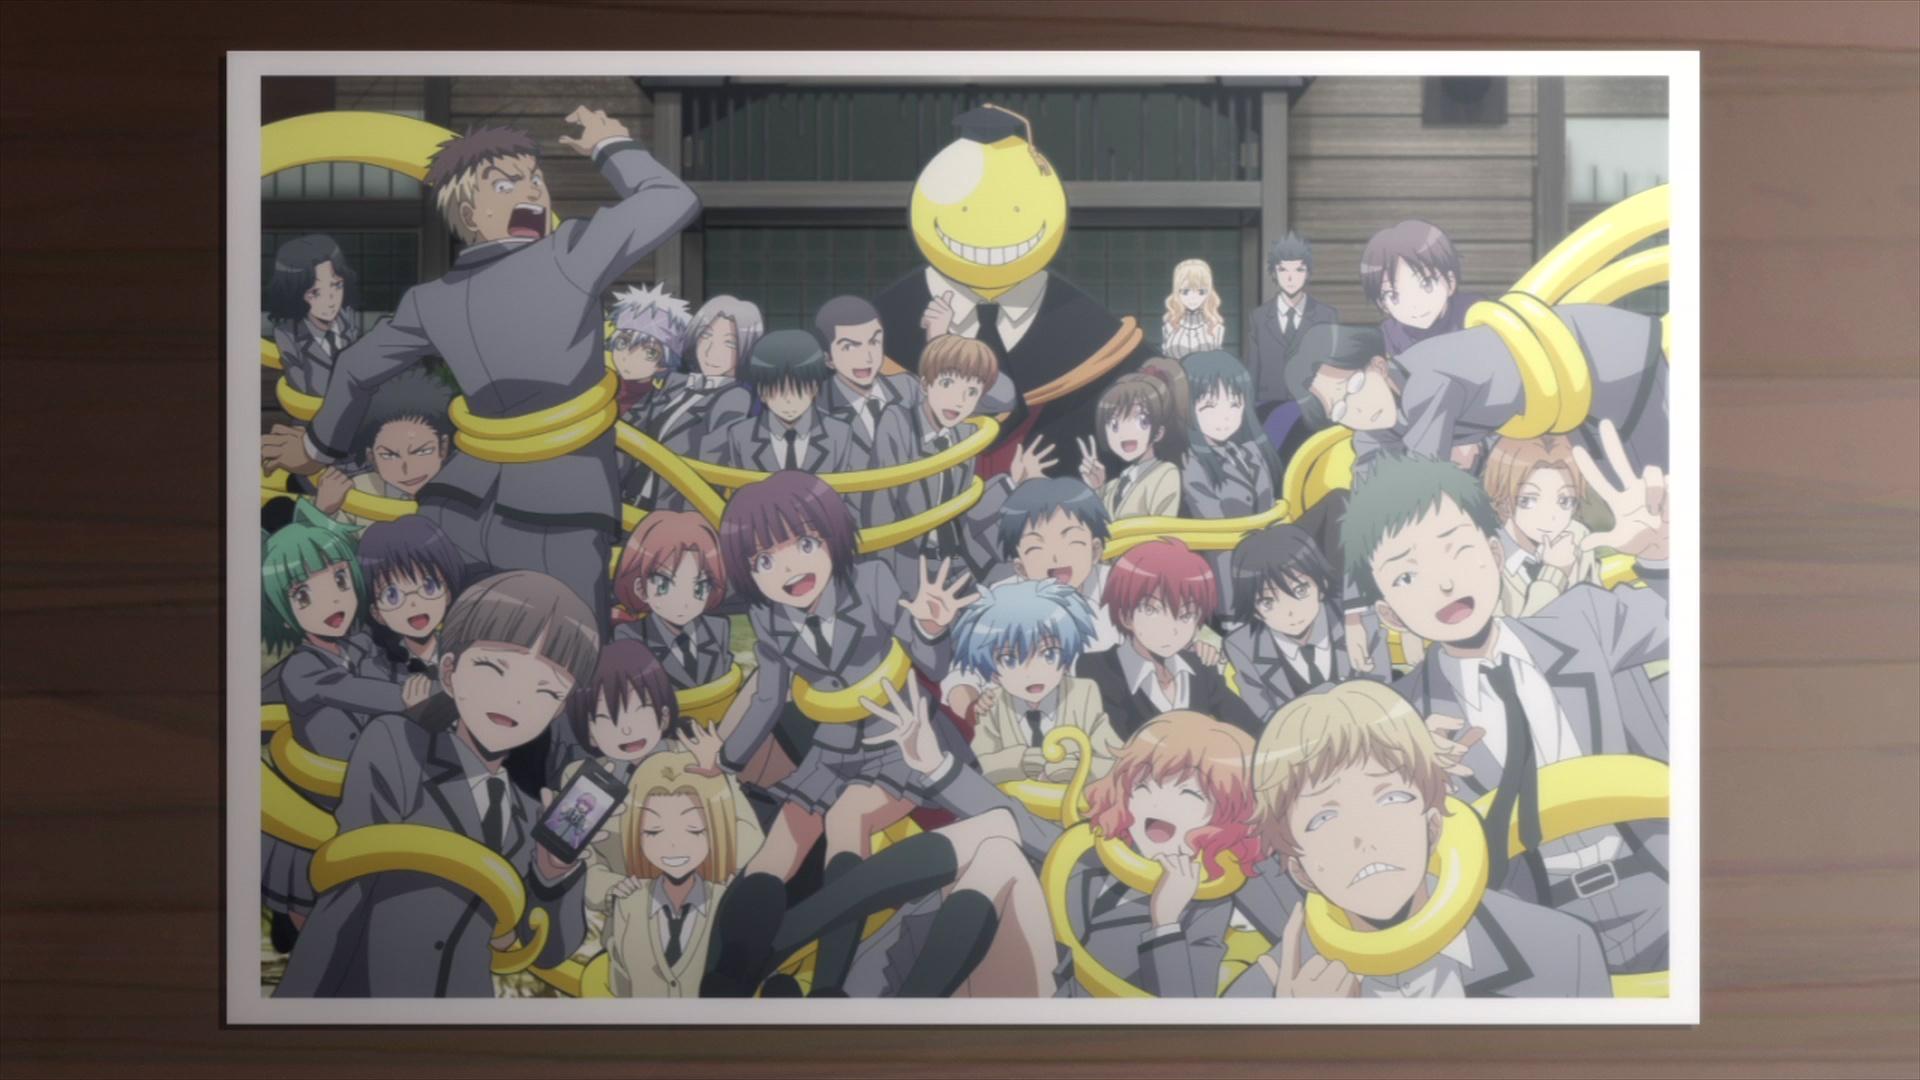 16+ Anime Laptop Wallpaper Assasination Classroom Images